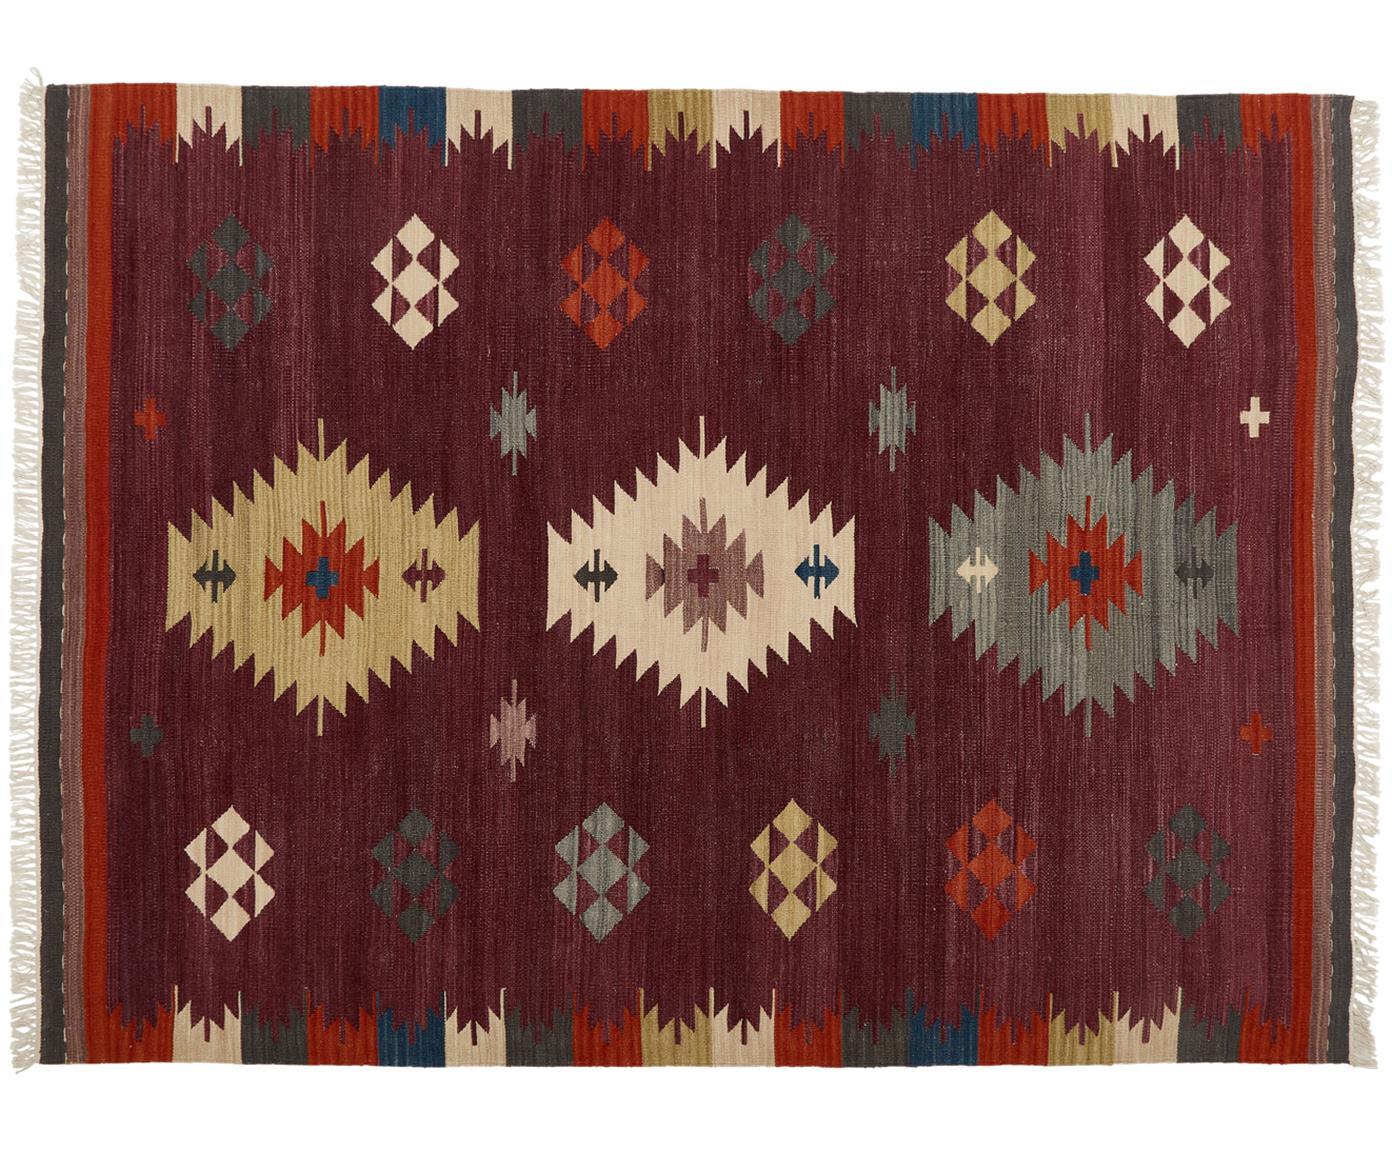 Alfombra artesanal de lana Kilim, Lana, Lila oscuro, multicolor, An 125 x L 185 cm (Tamaño S)